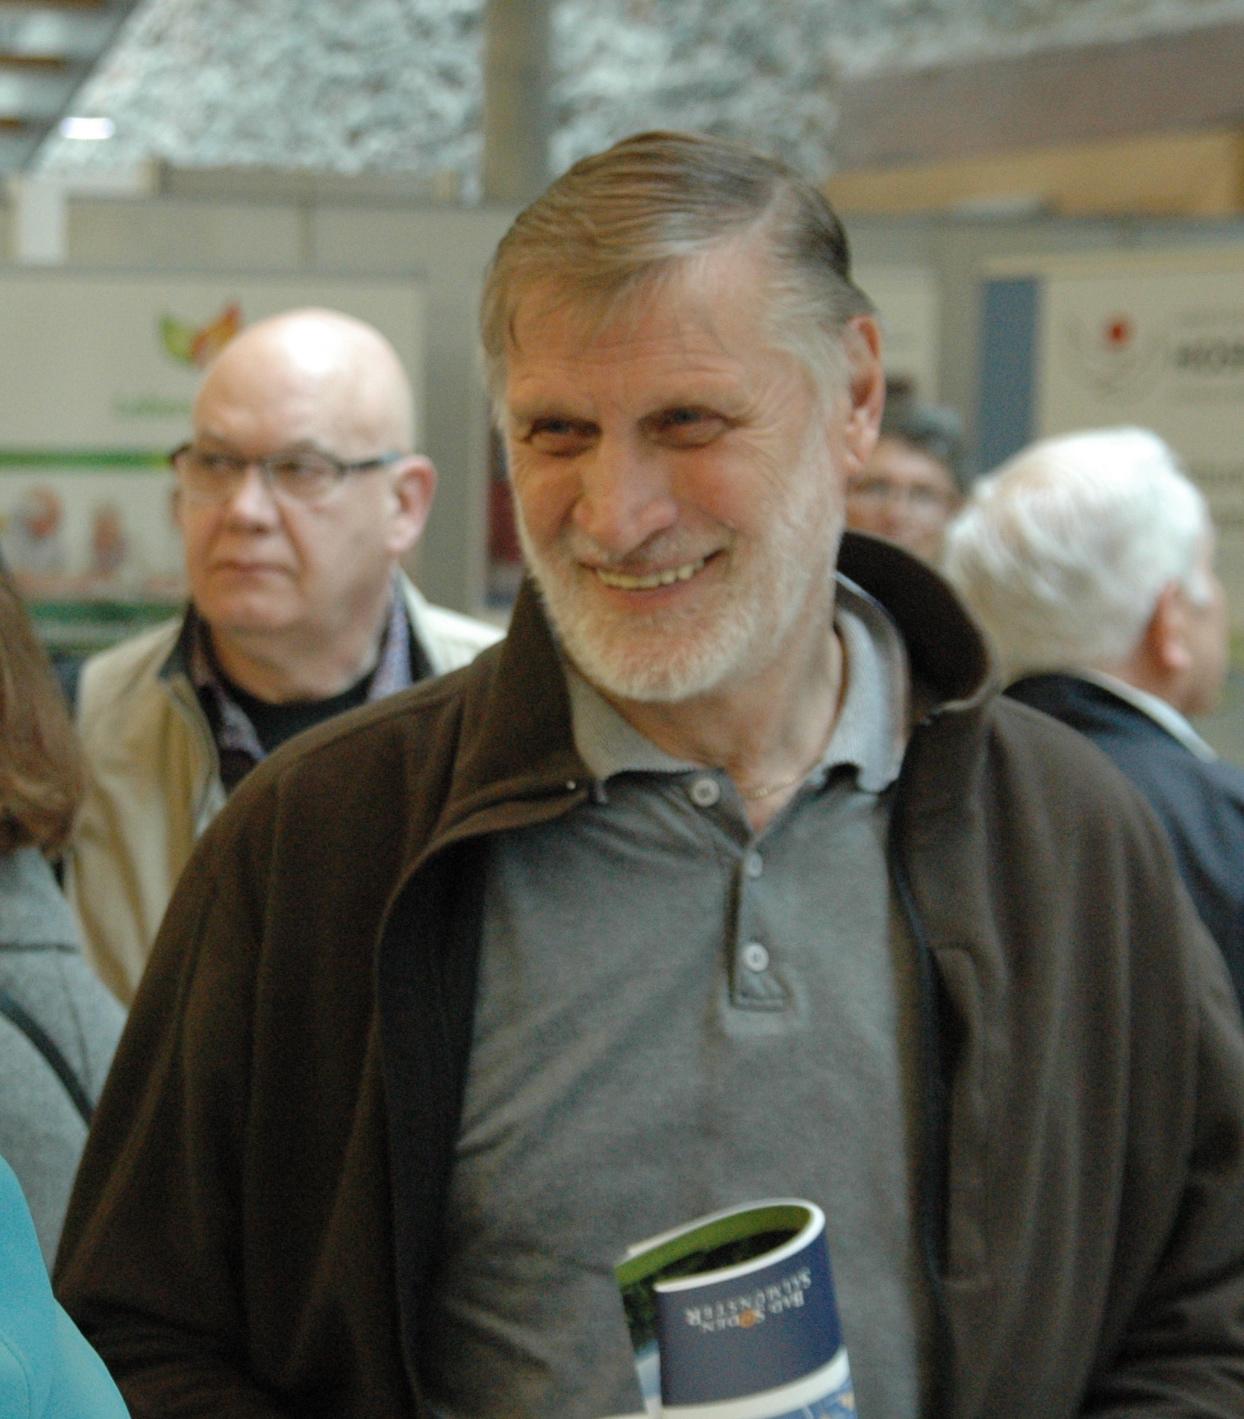 Gesundheitsmesse Hanau 2016